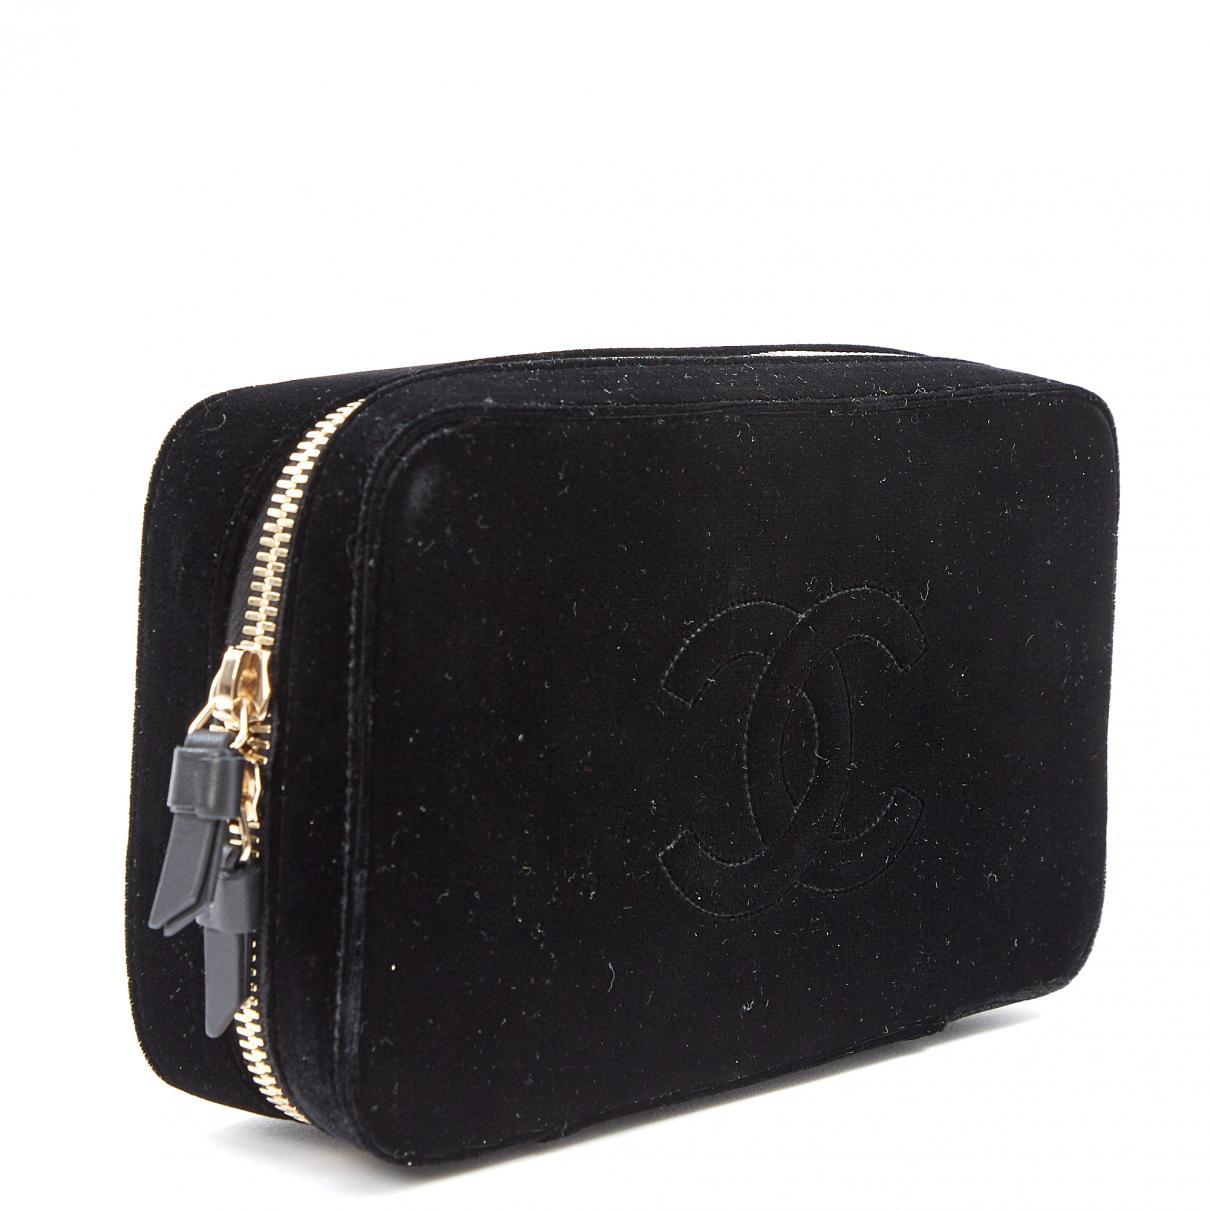 9a0d692baac948 Lyst - Chanel Velvet Clutch Bag in Black